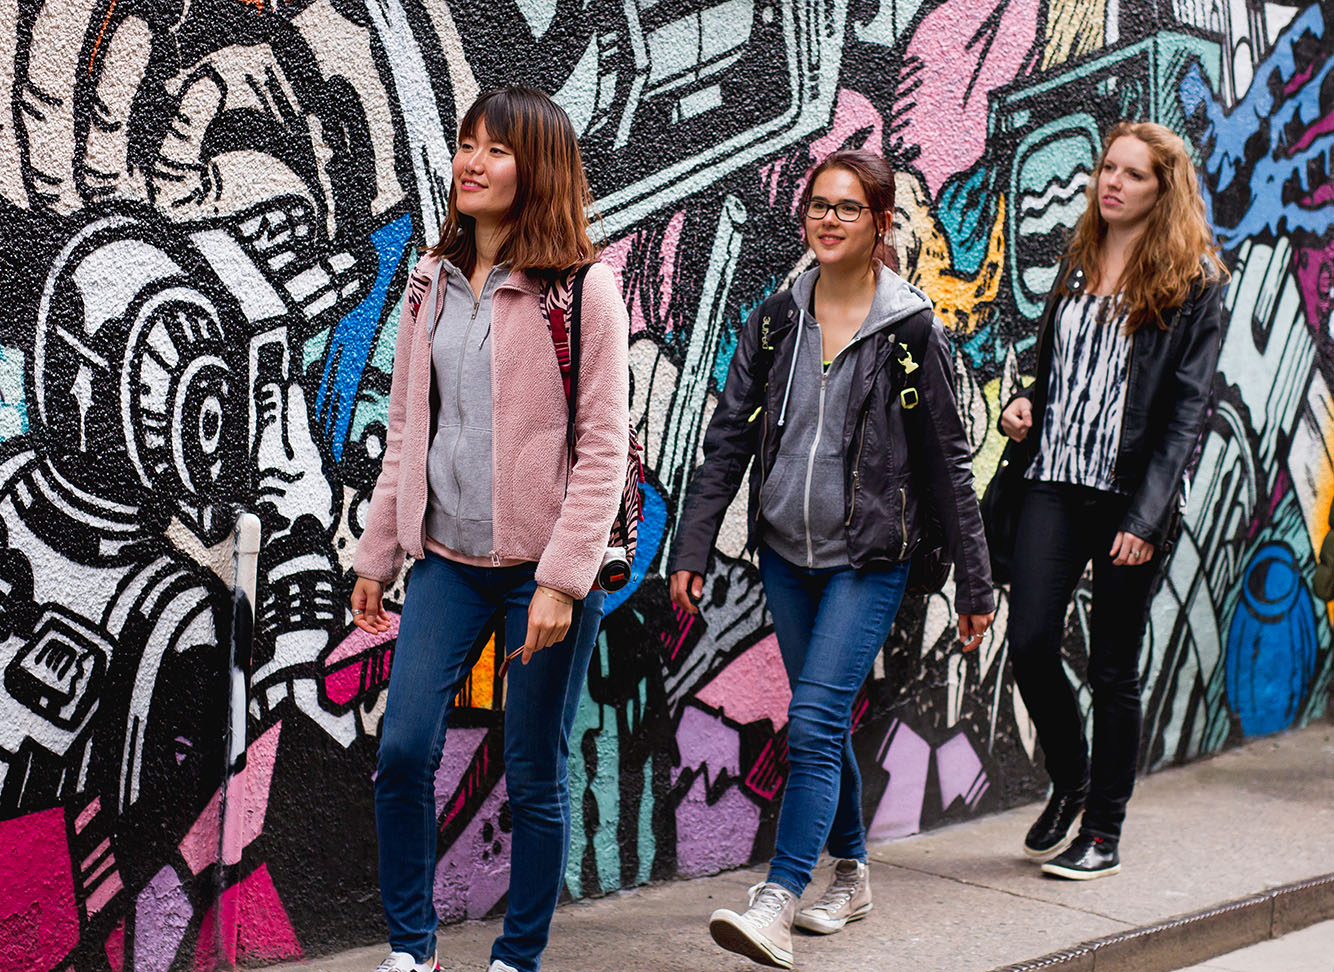 Learn English in England: Students on a graffiti walk